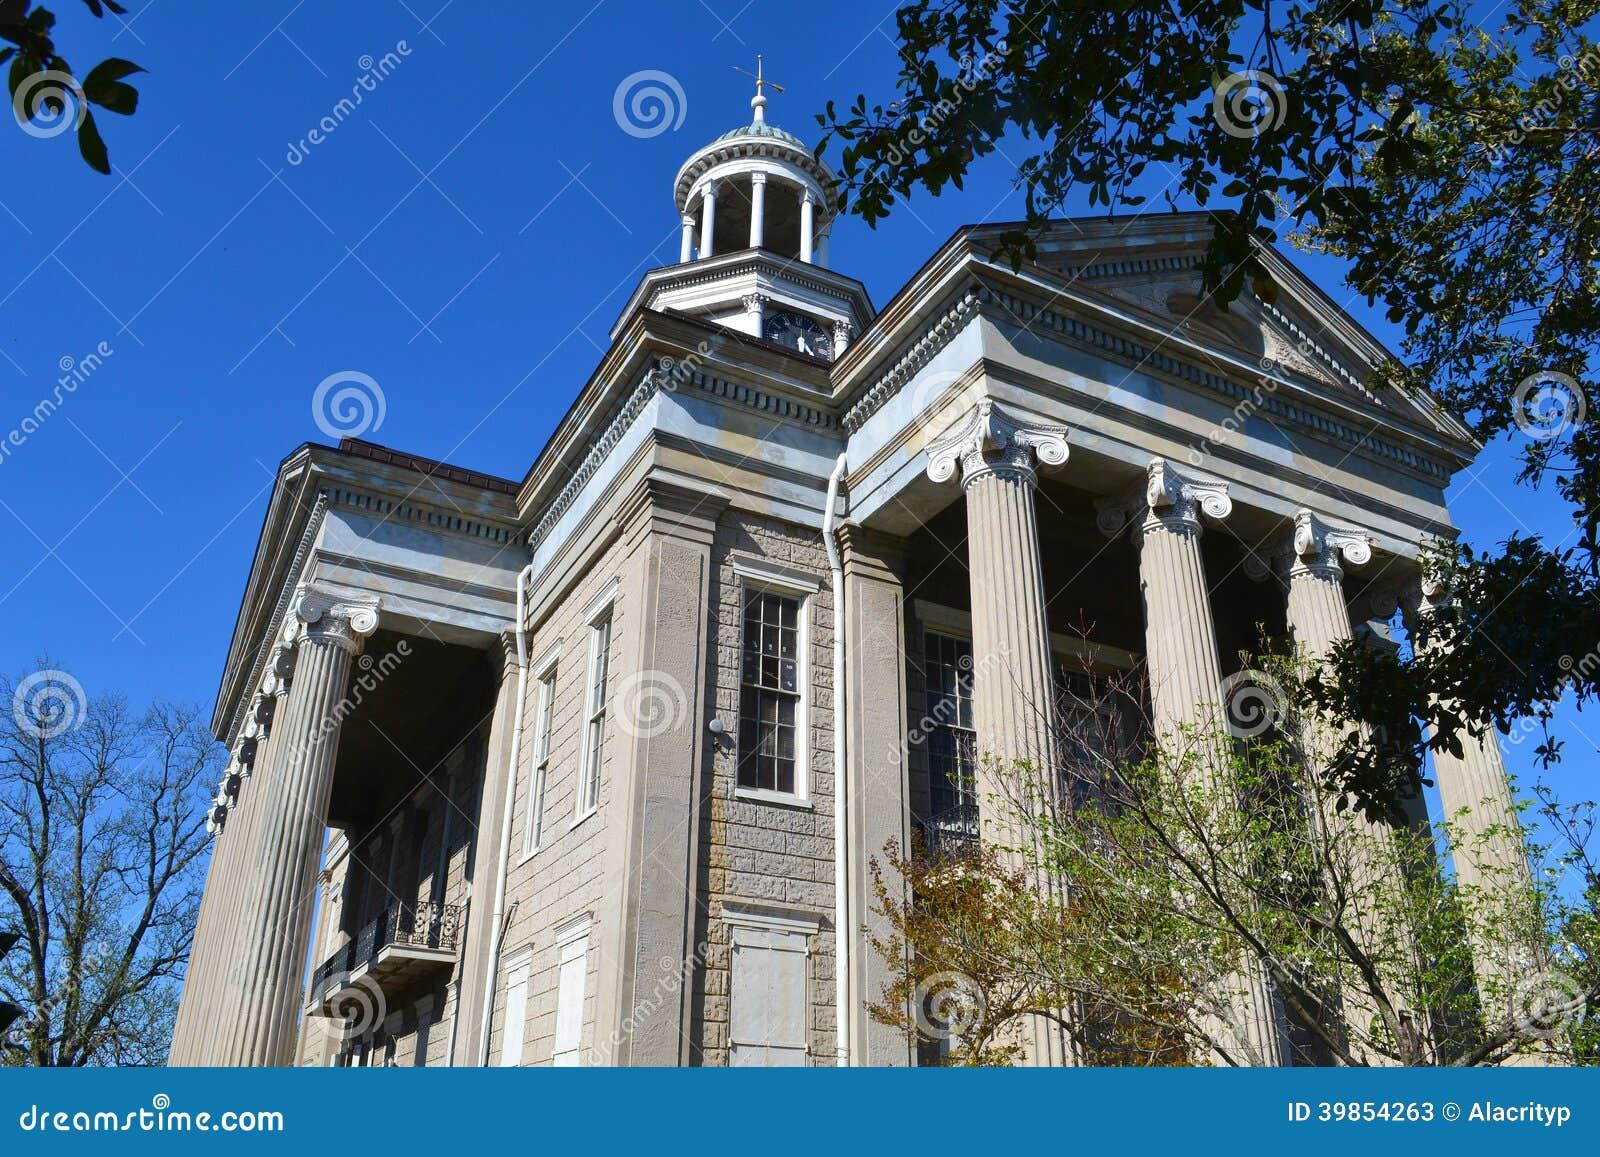 Old Courthouse in Vicksburg, Mississippi